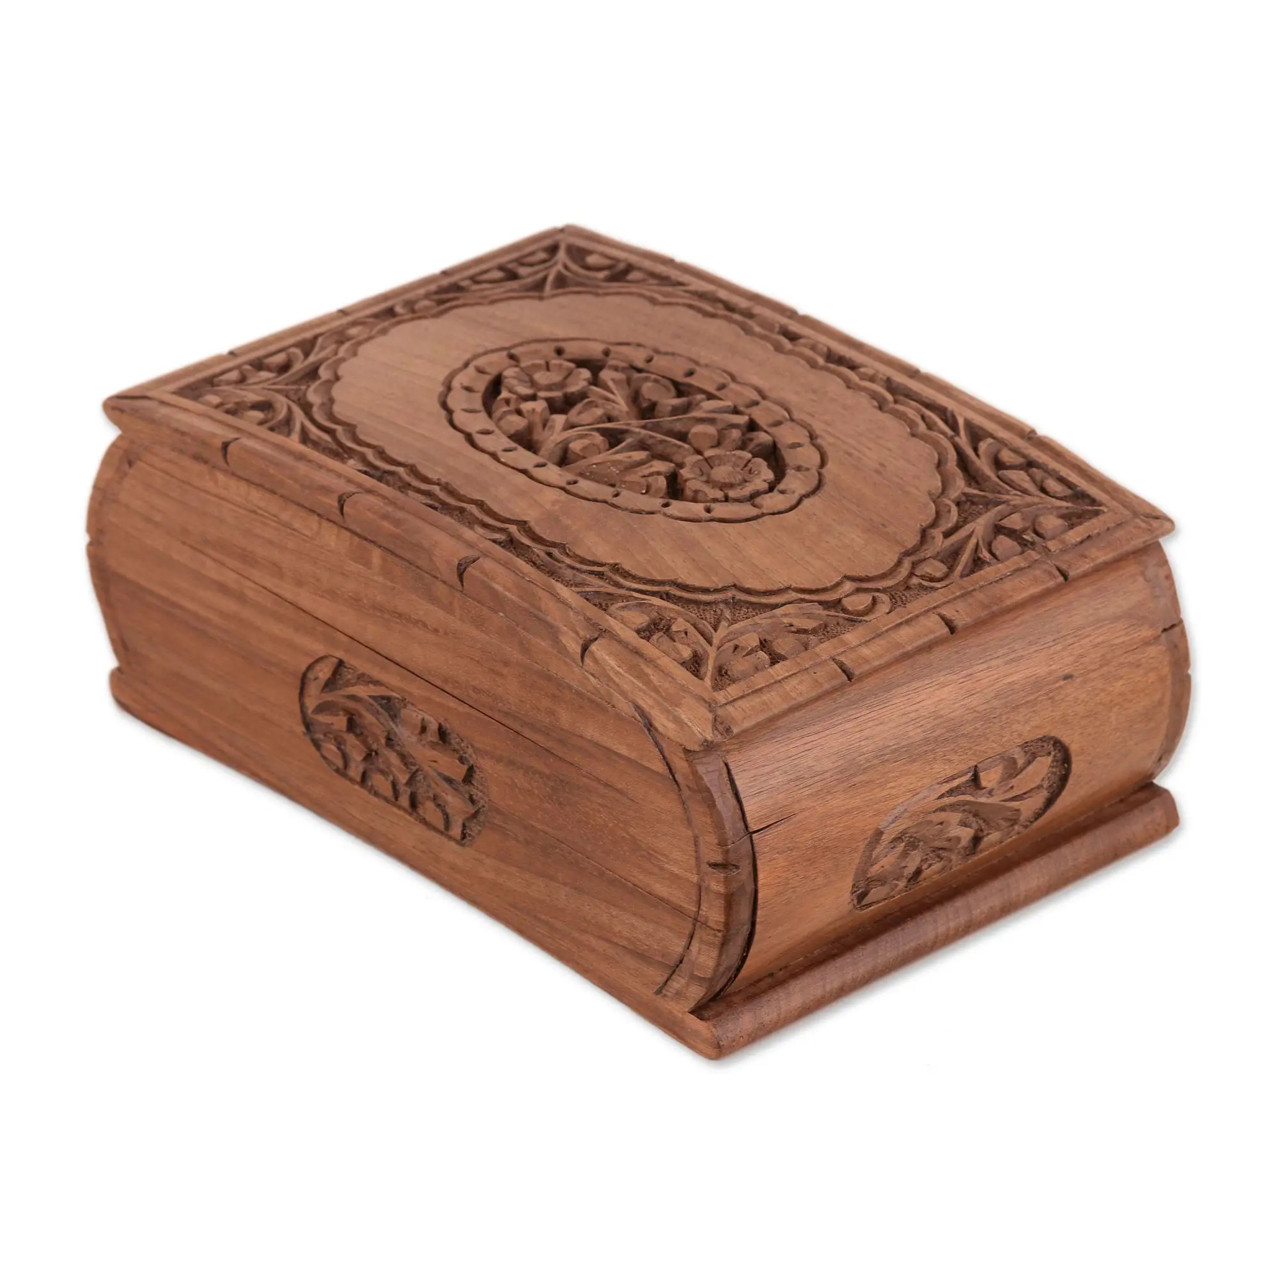 "Unique Gift Idea - Handcrafted Jewellery Box ""Love's Embrace"""